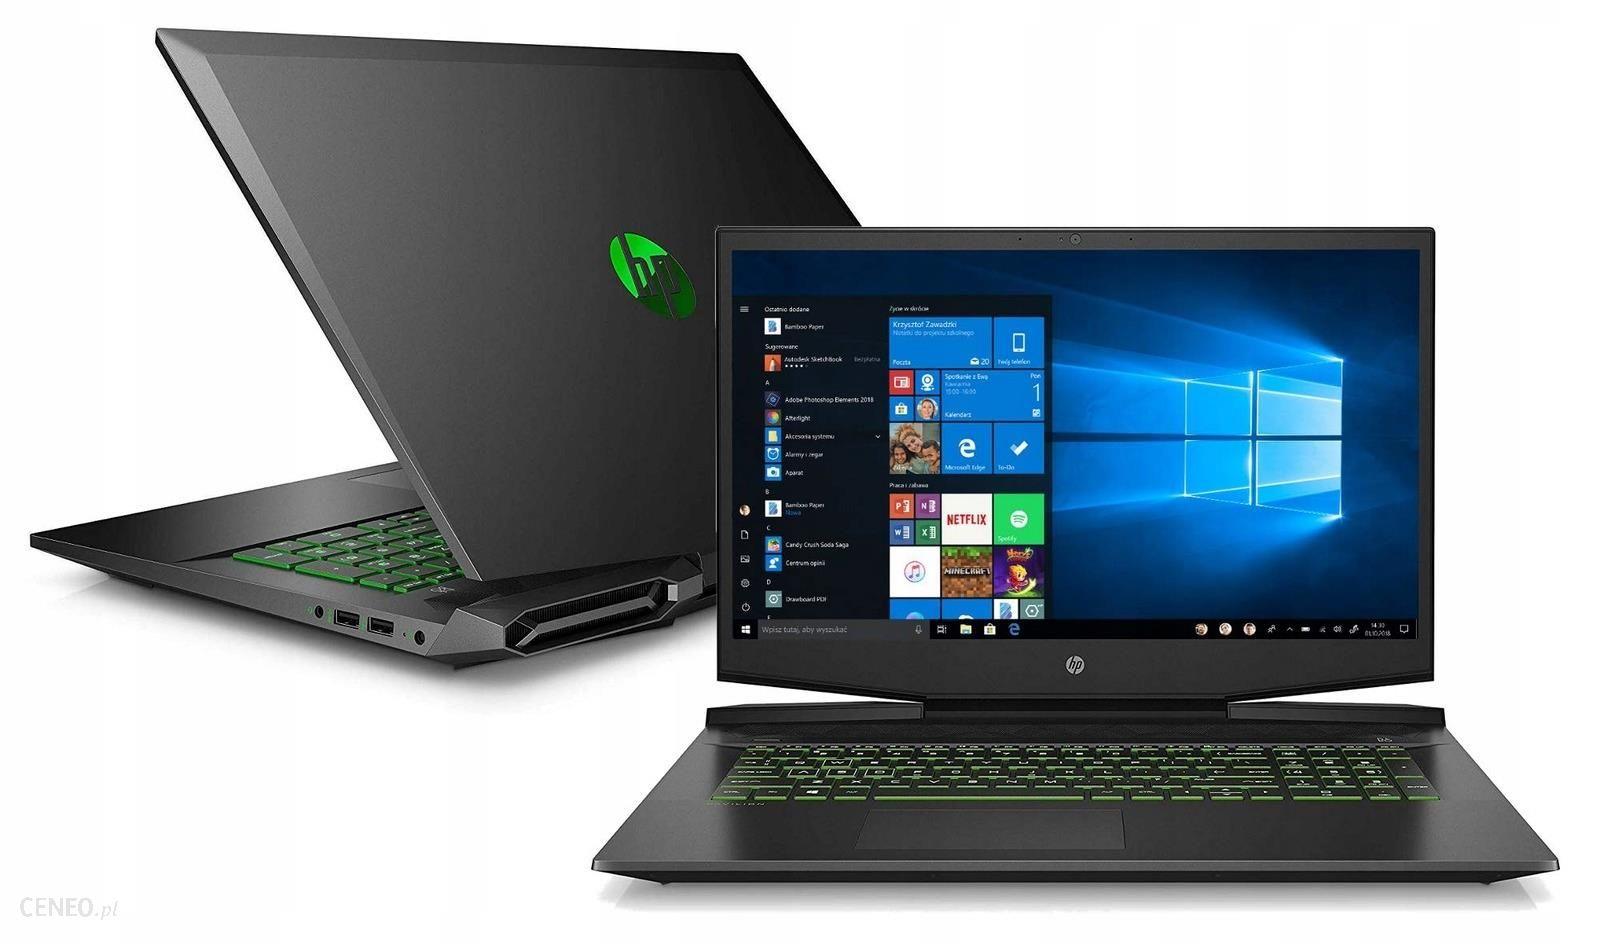 Laptop HP Pavilion Gaming 17-cd0020nw 17,3″/i5/8GB/512GB/Win10 (7PW33EA)